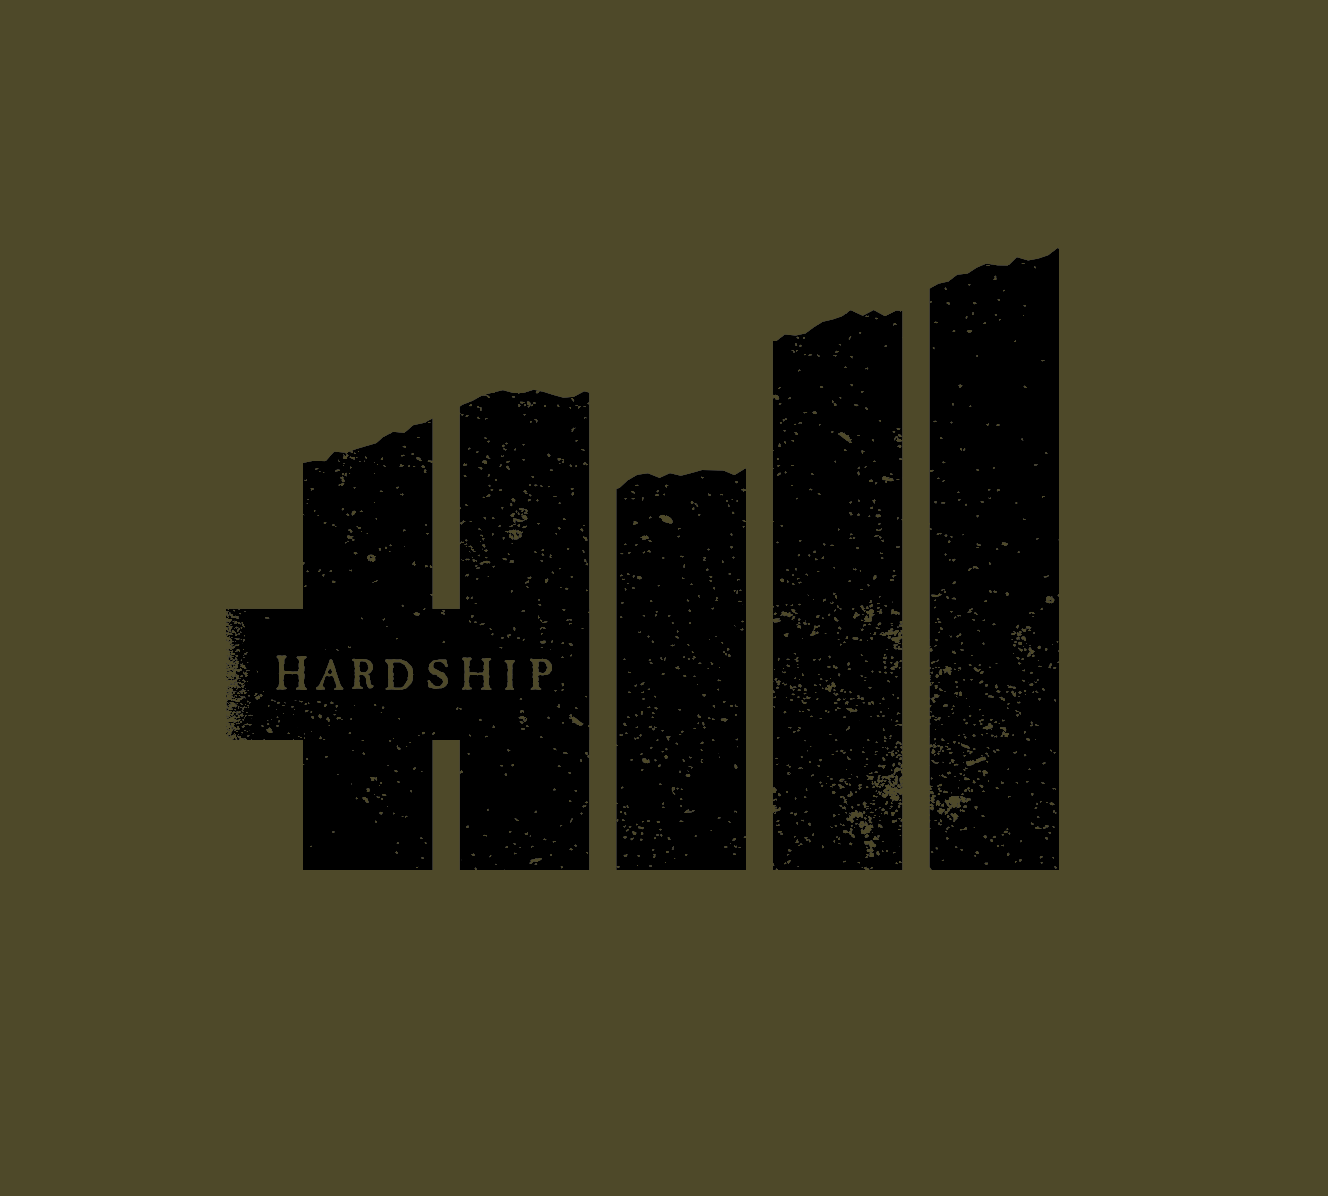 Hardship Hill